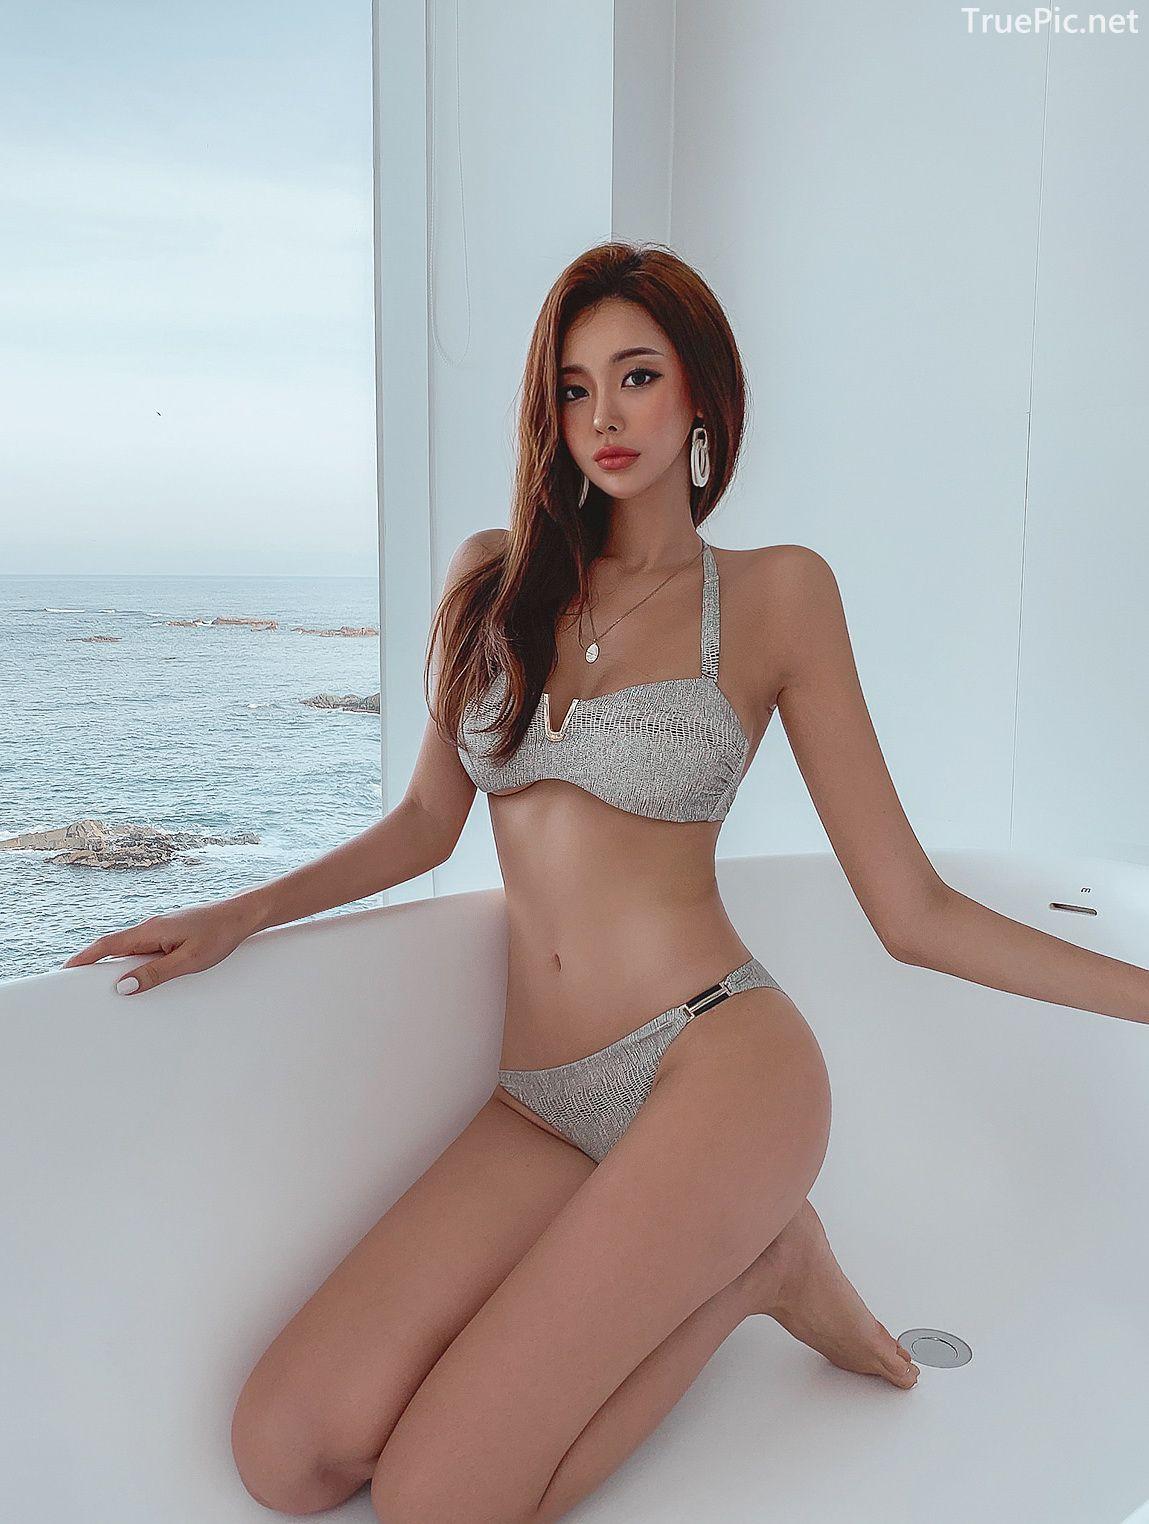 Korean lingerie queen - Park Da Hyun - Chloe python Bikini - Picture 8